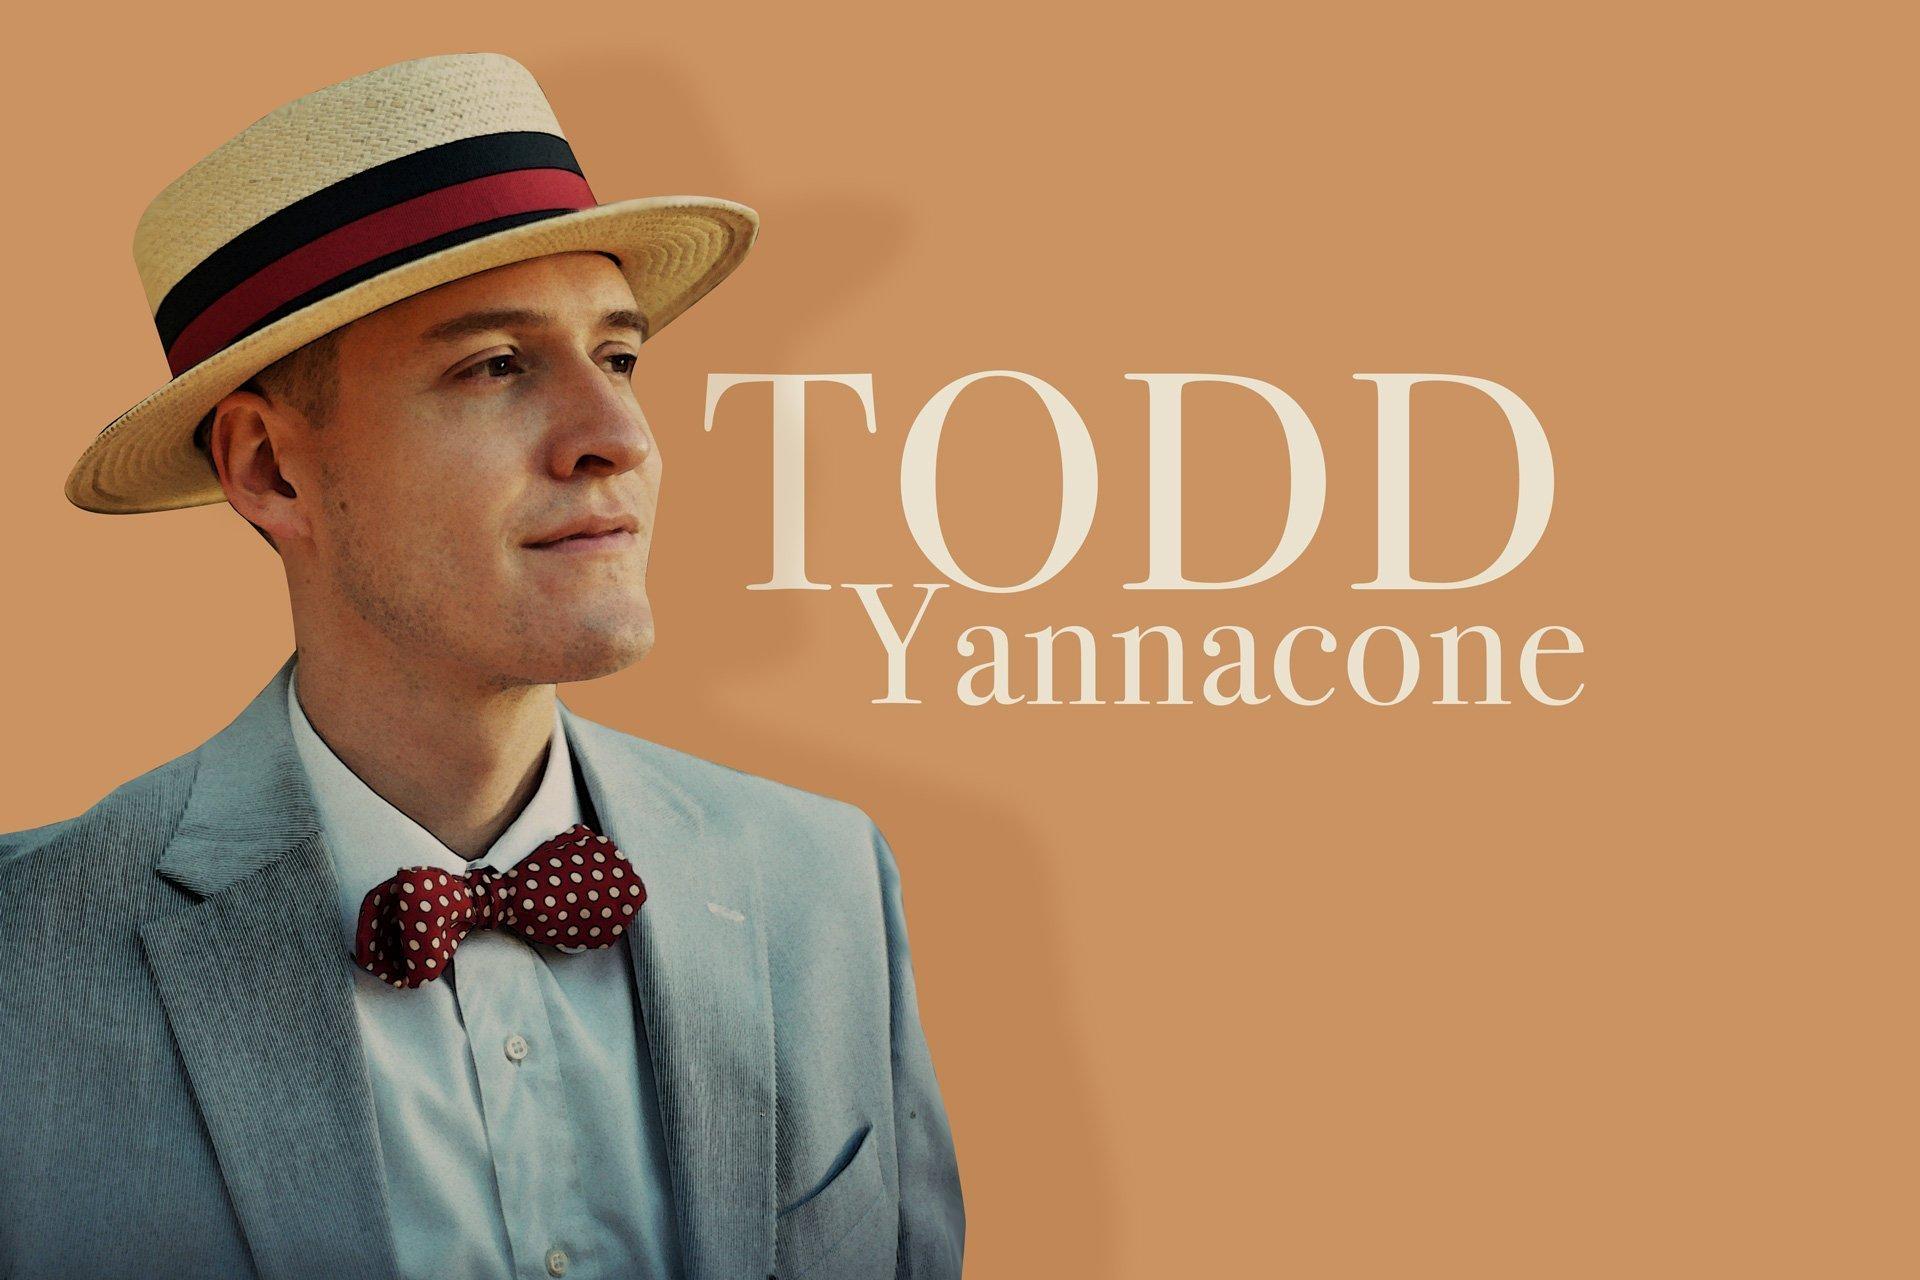 Todd Yannacone